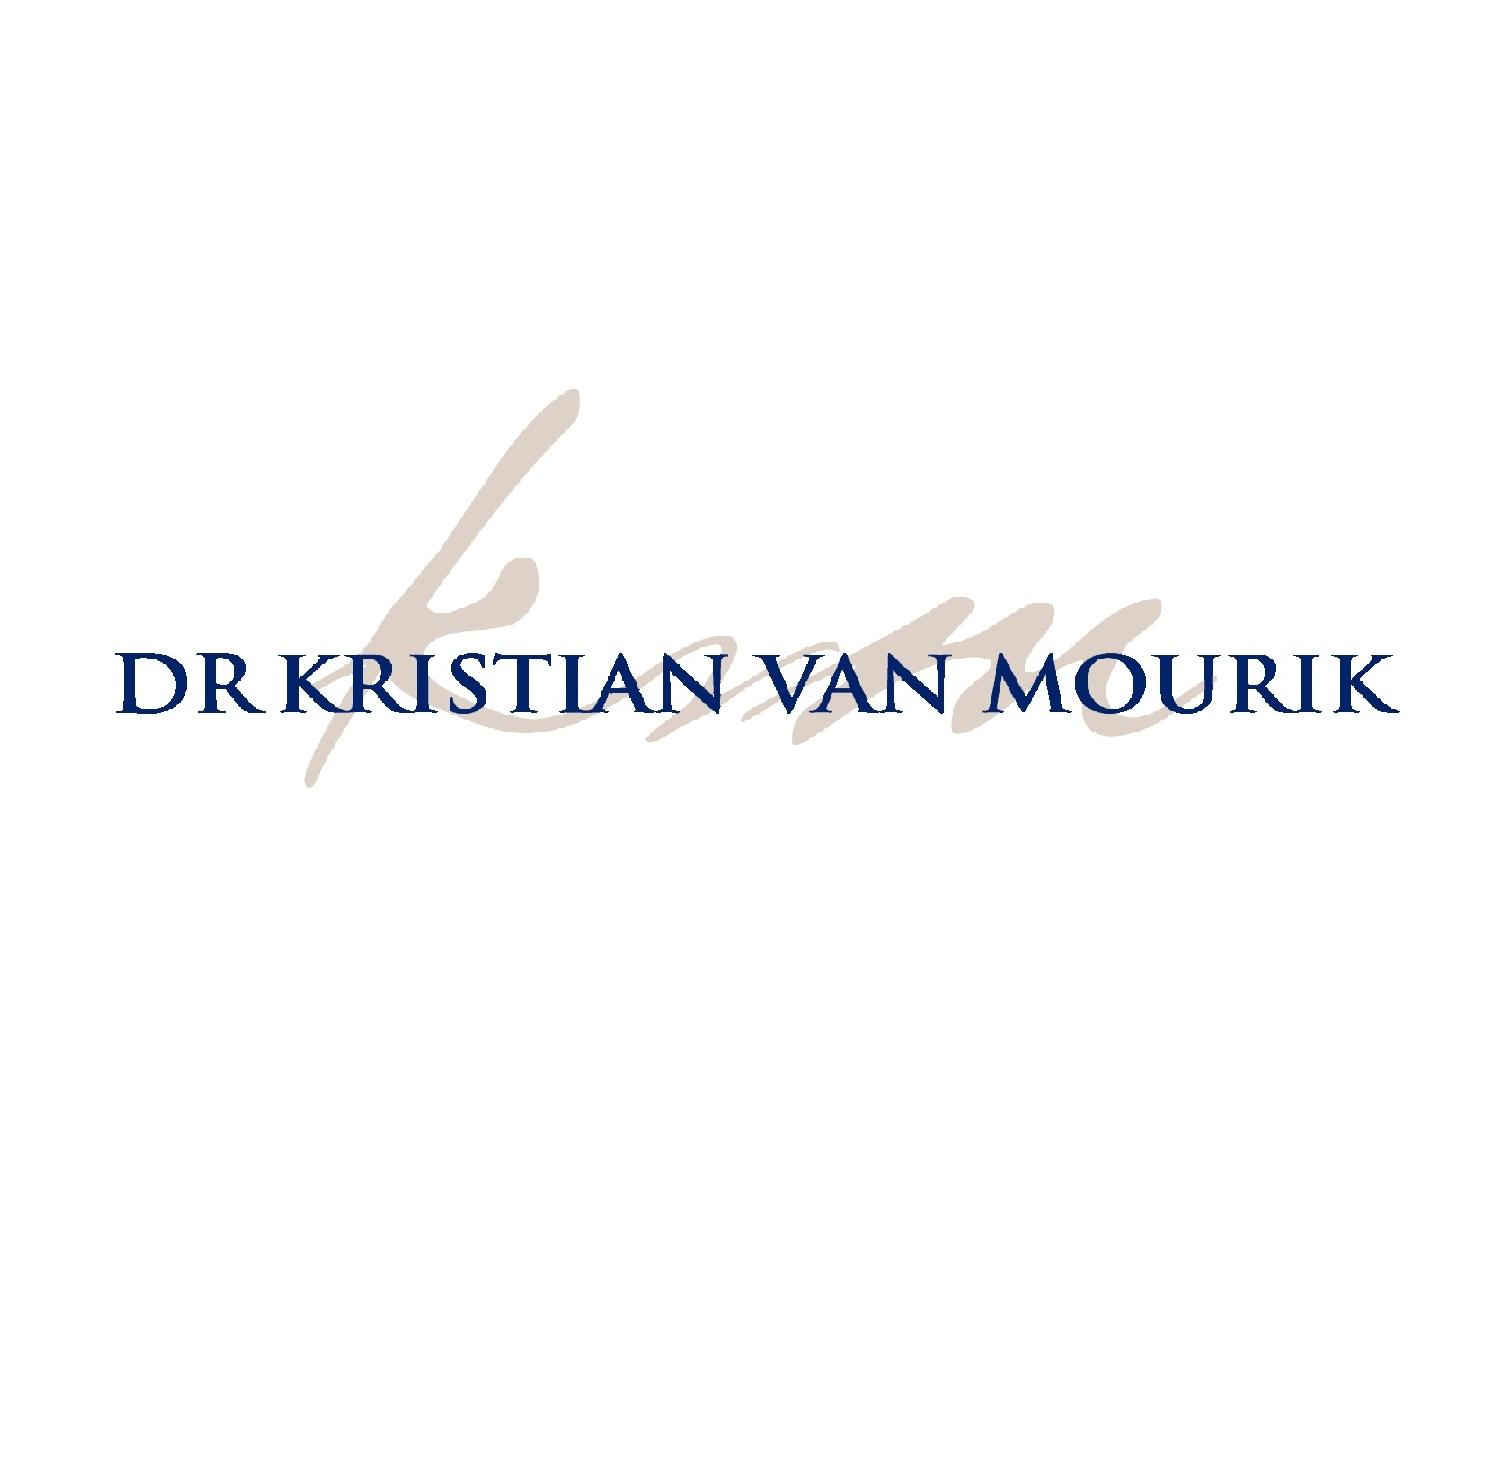 Dr Kristian van Mourik image